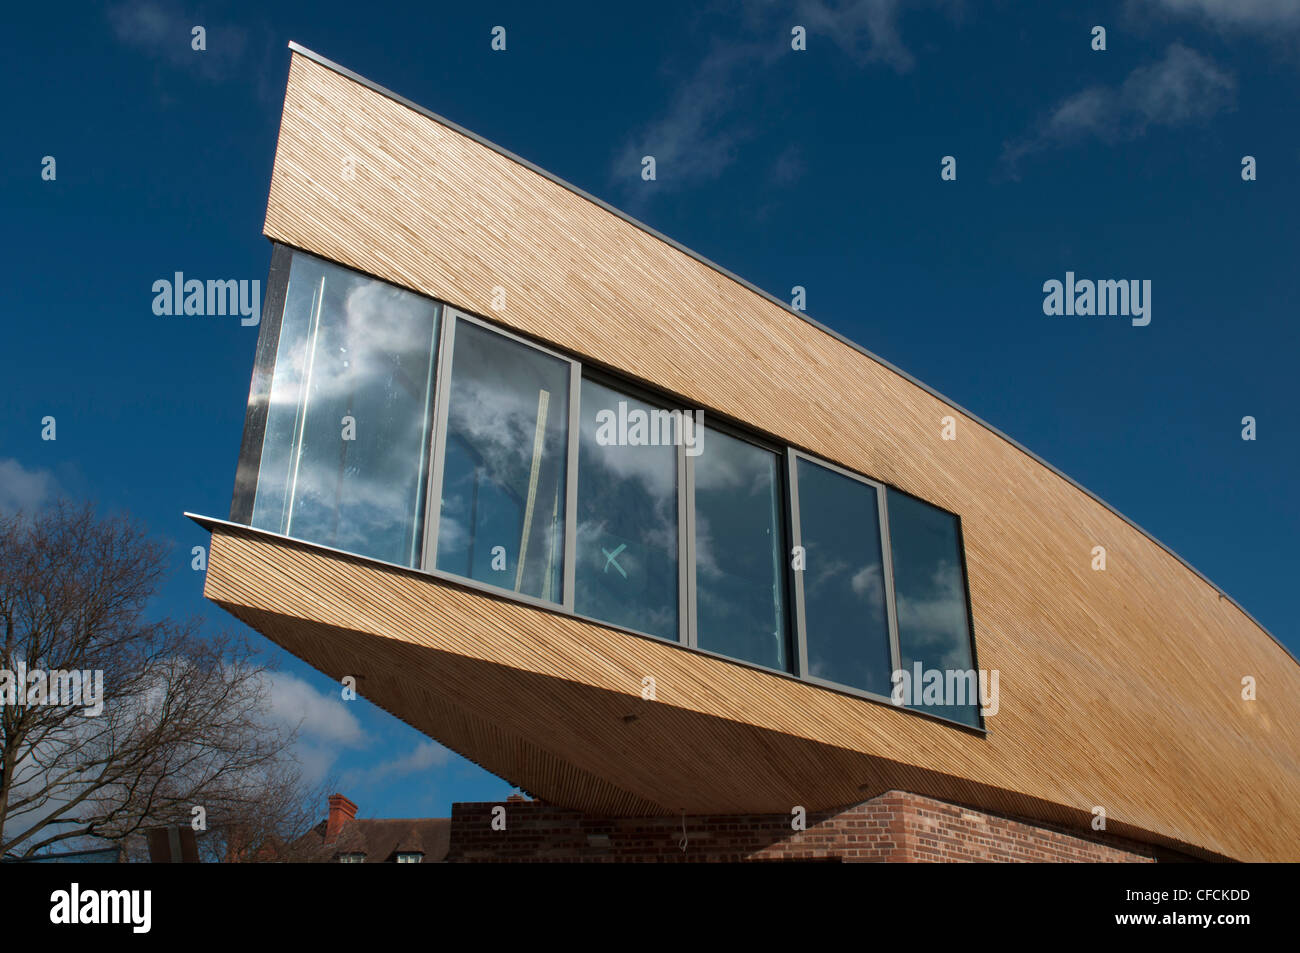 Michael Baker Boathouse, Kings School, Worcester, UK - Stock Image